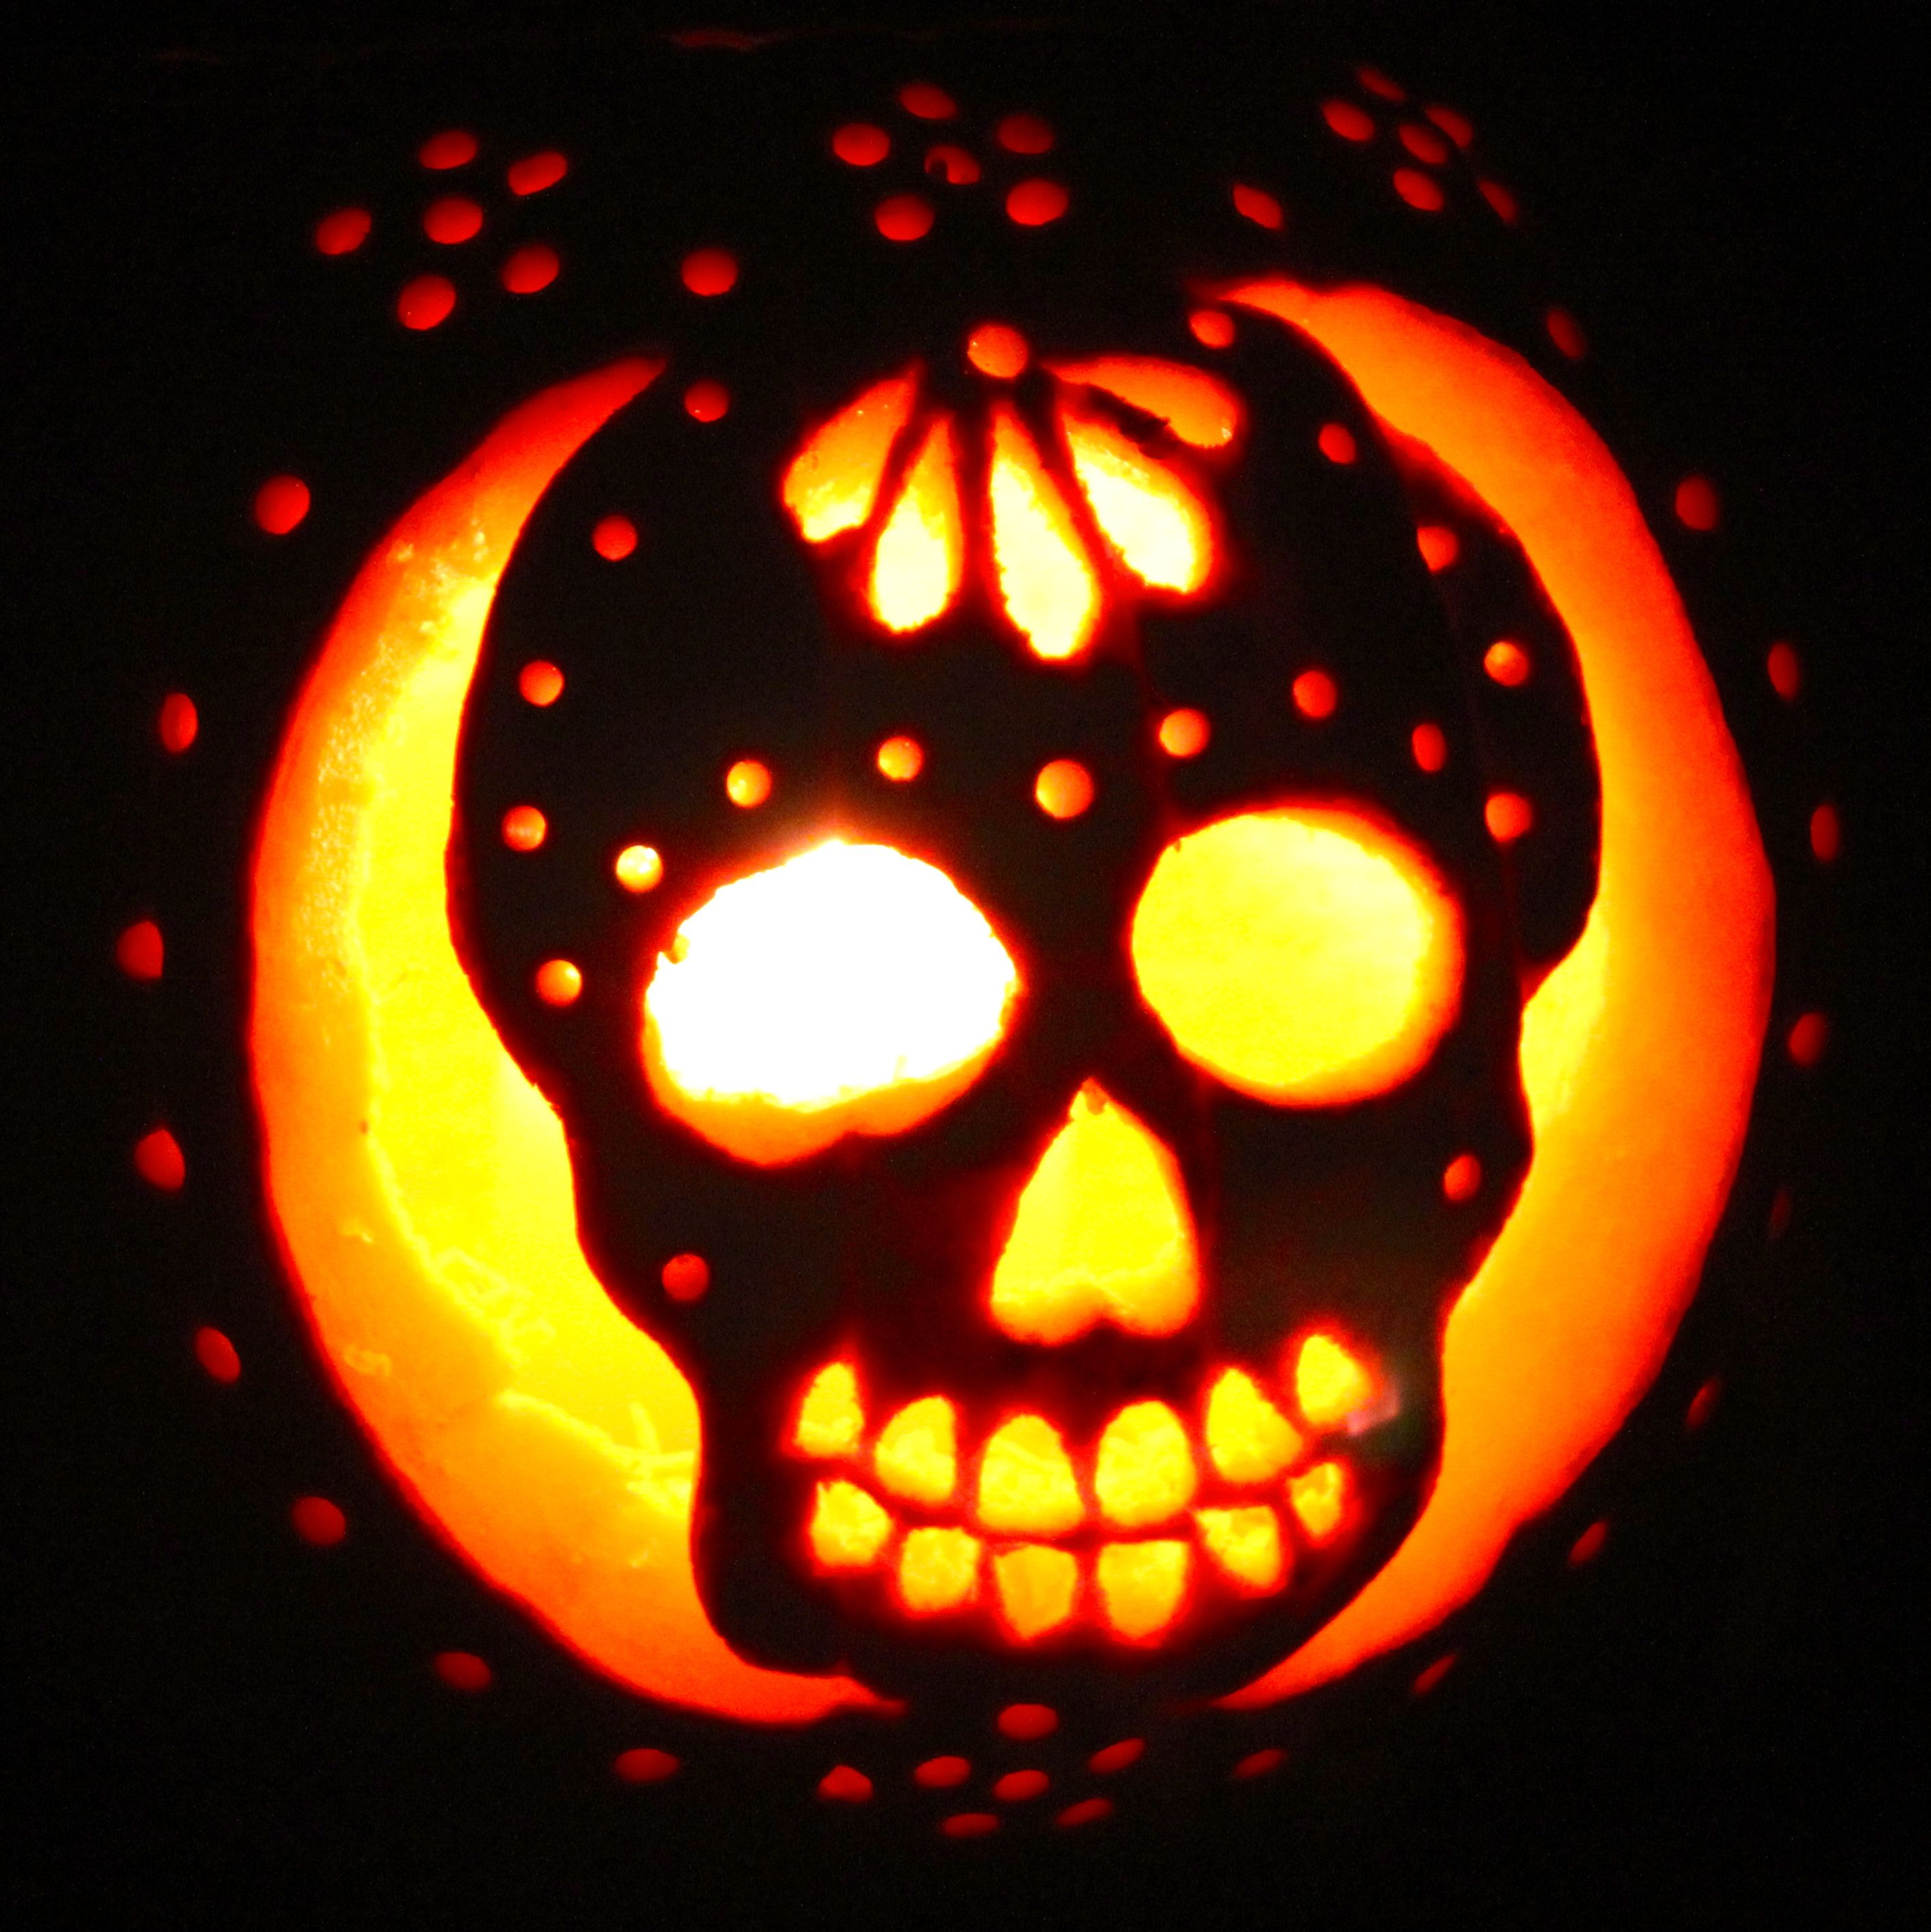 My Sugar Skull Pumpkin Halloween 2013 I 3 Halloween Pinterest